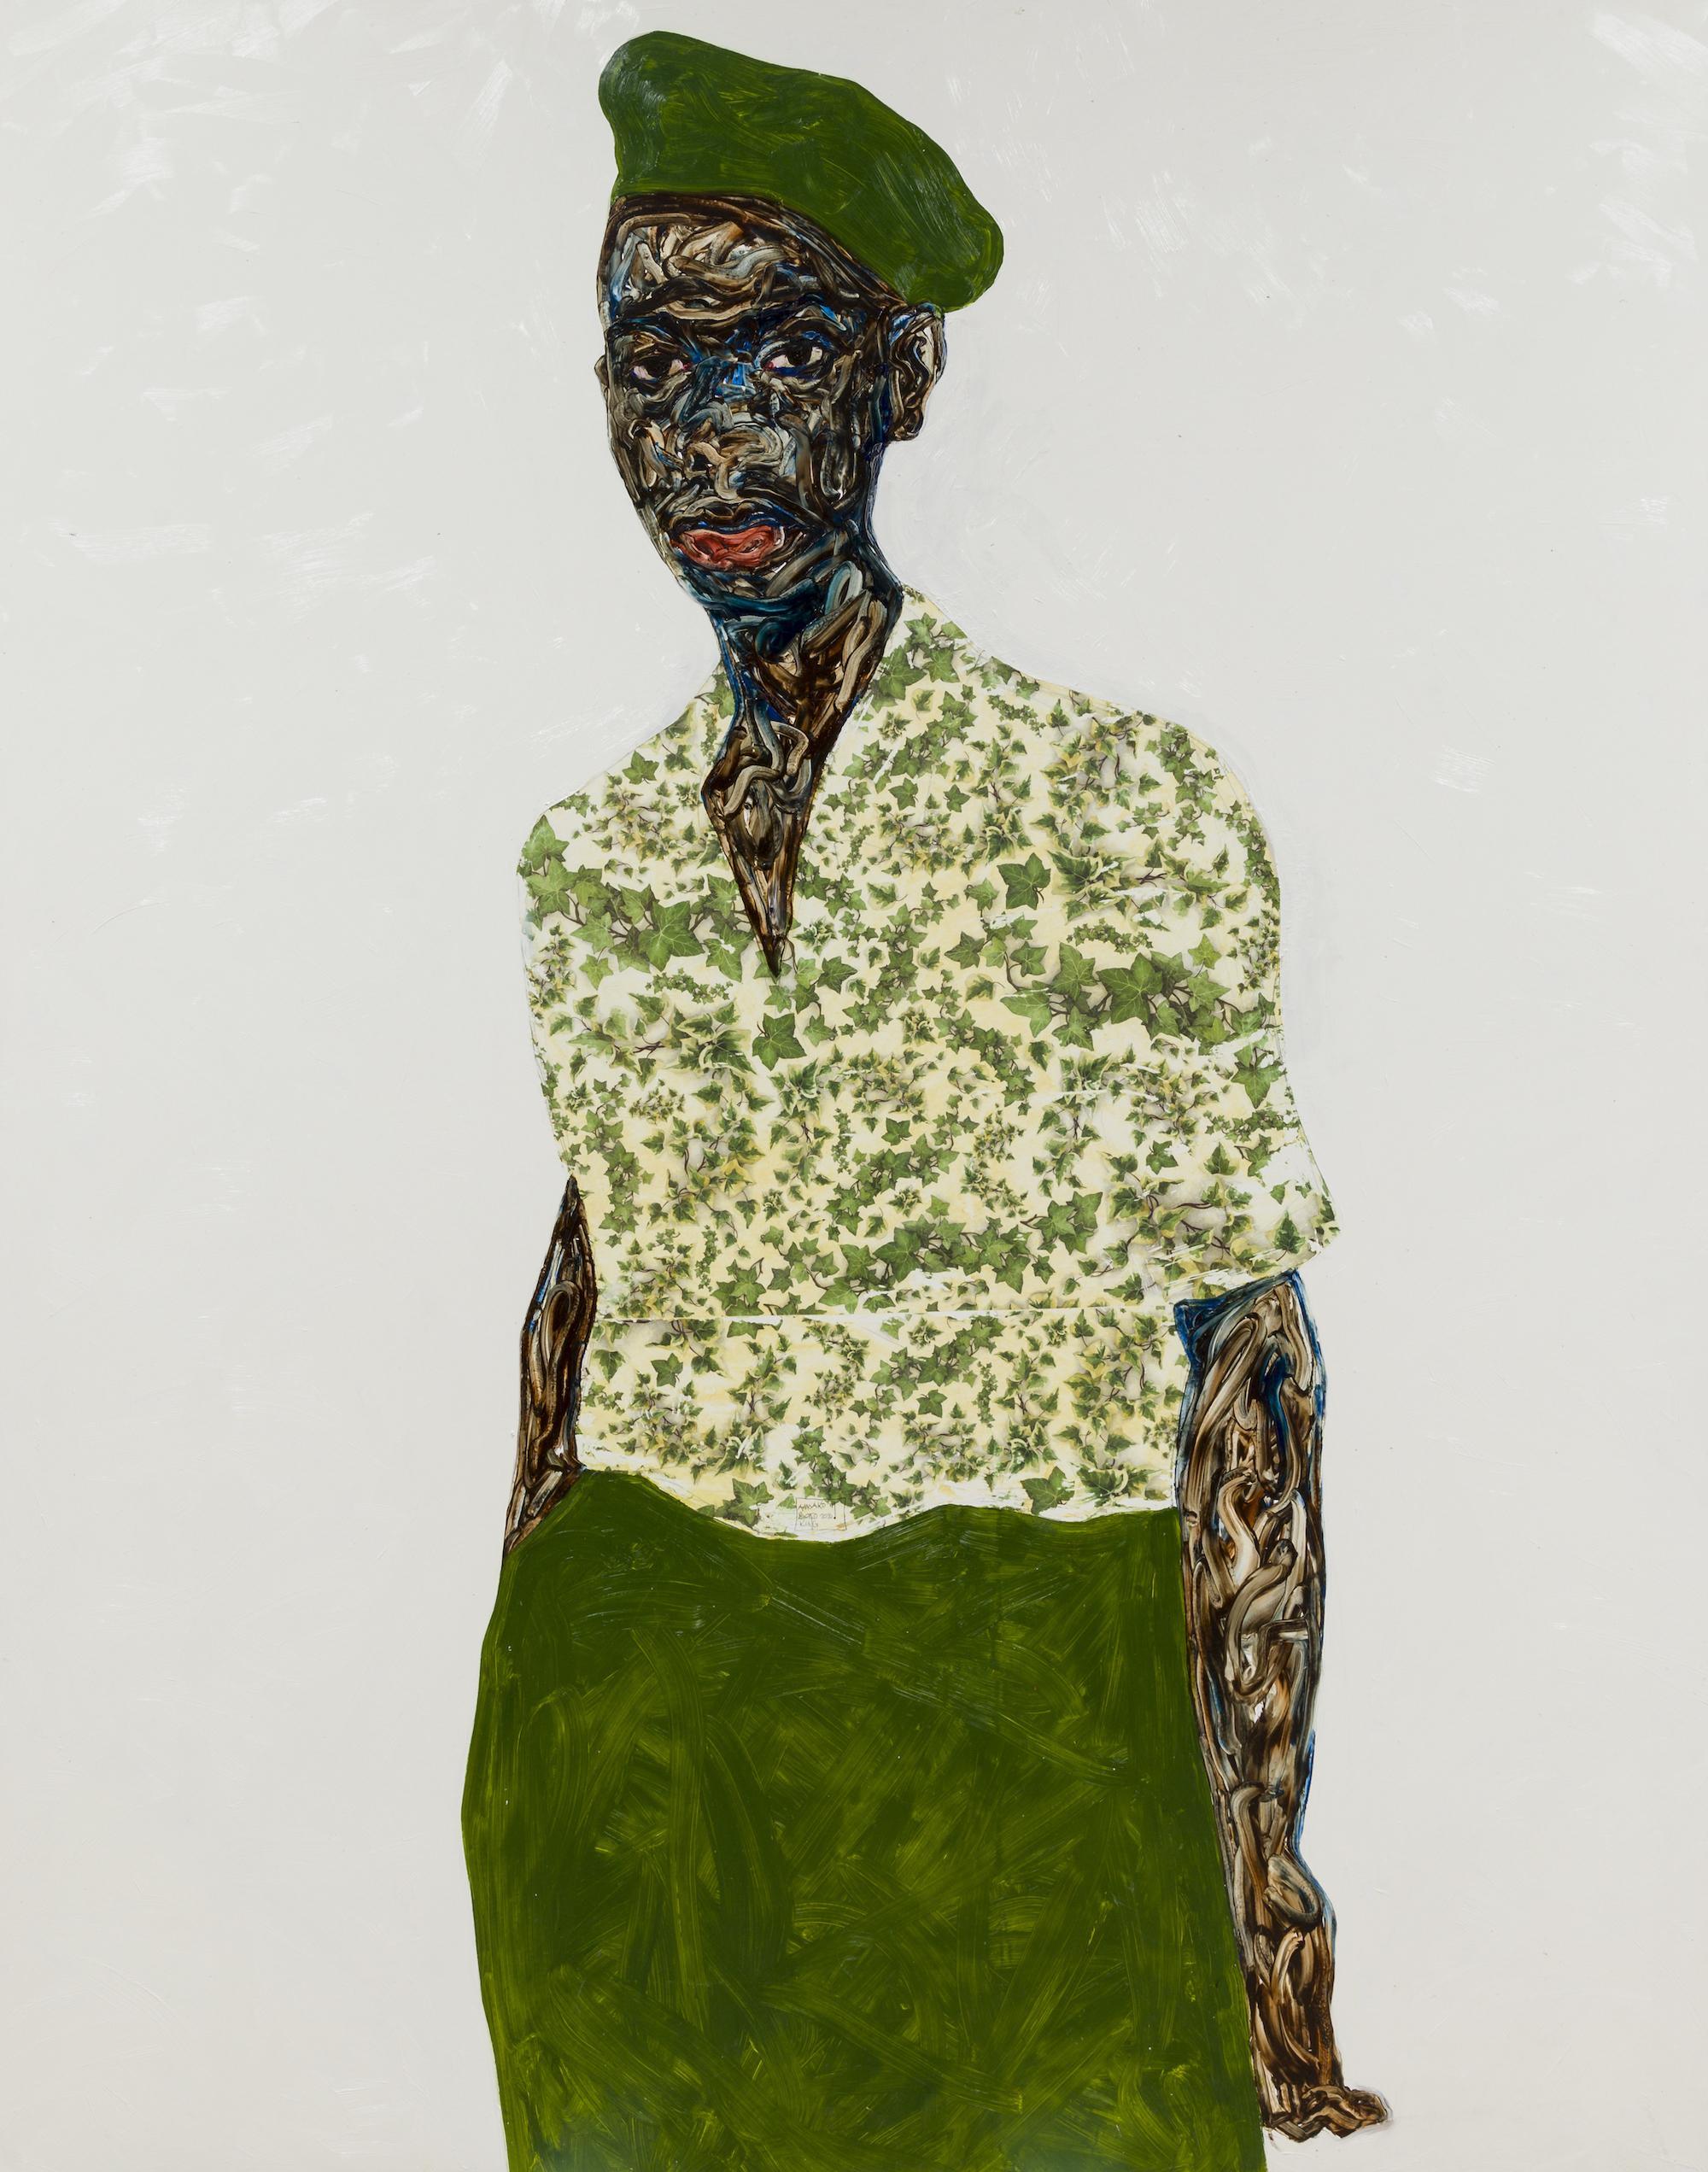 Amoako Boafo, Green Beret, 2020. Courtesy of Mariane Ibrahim